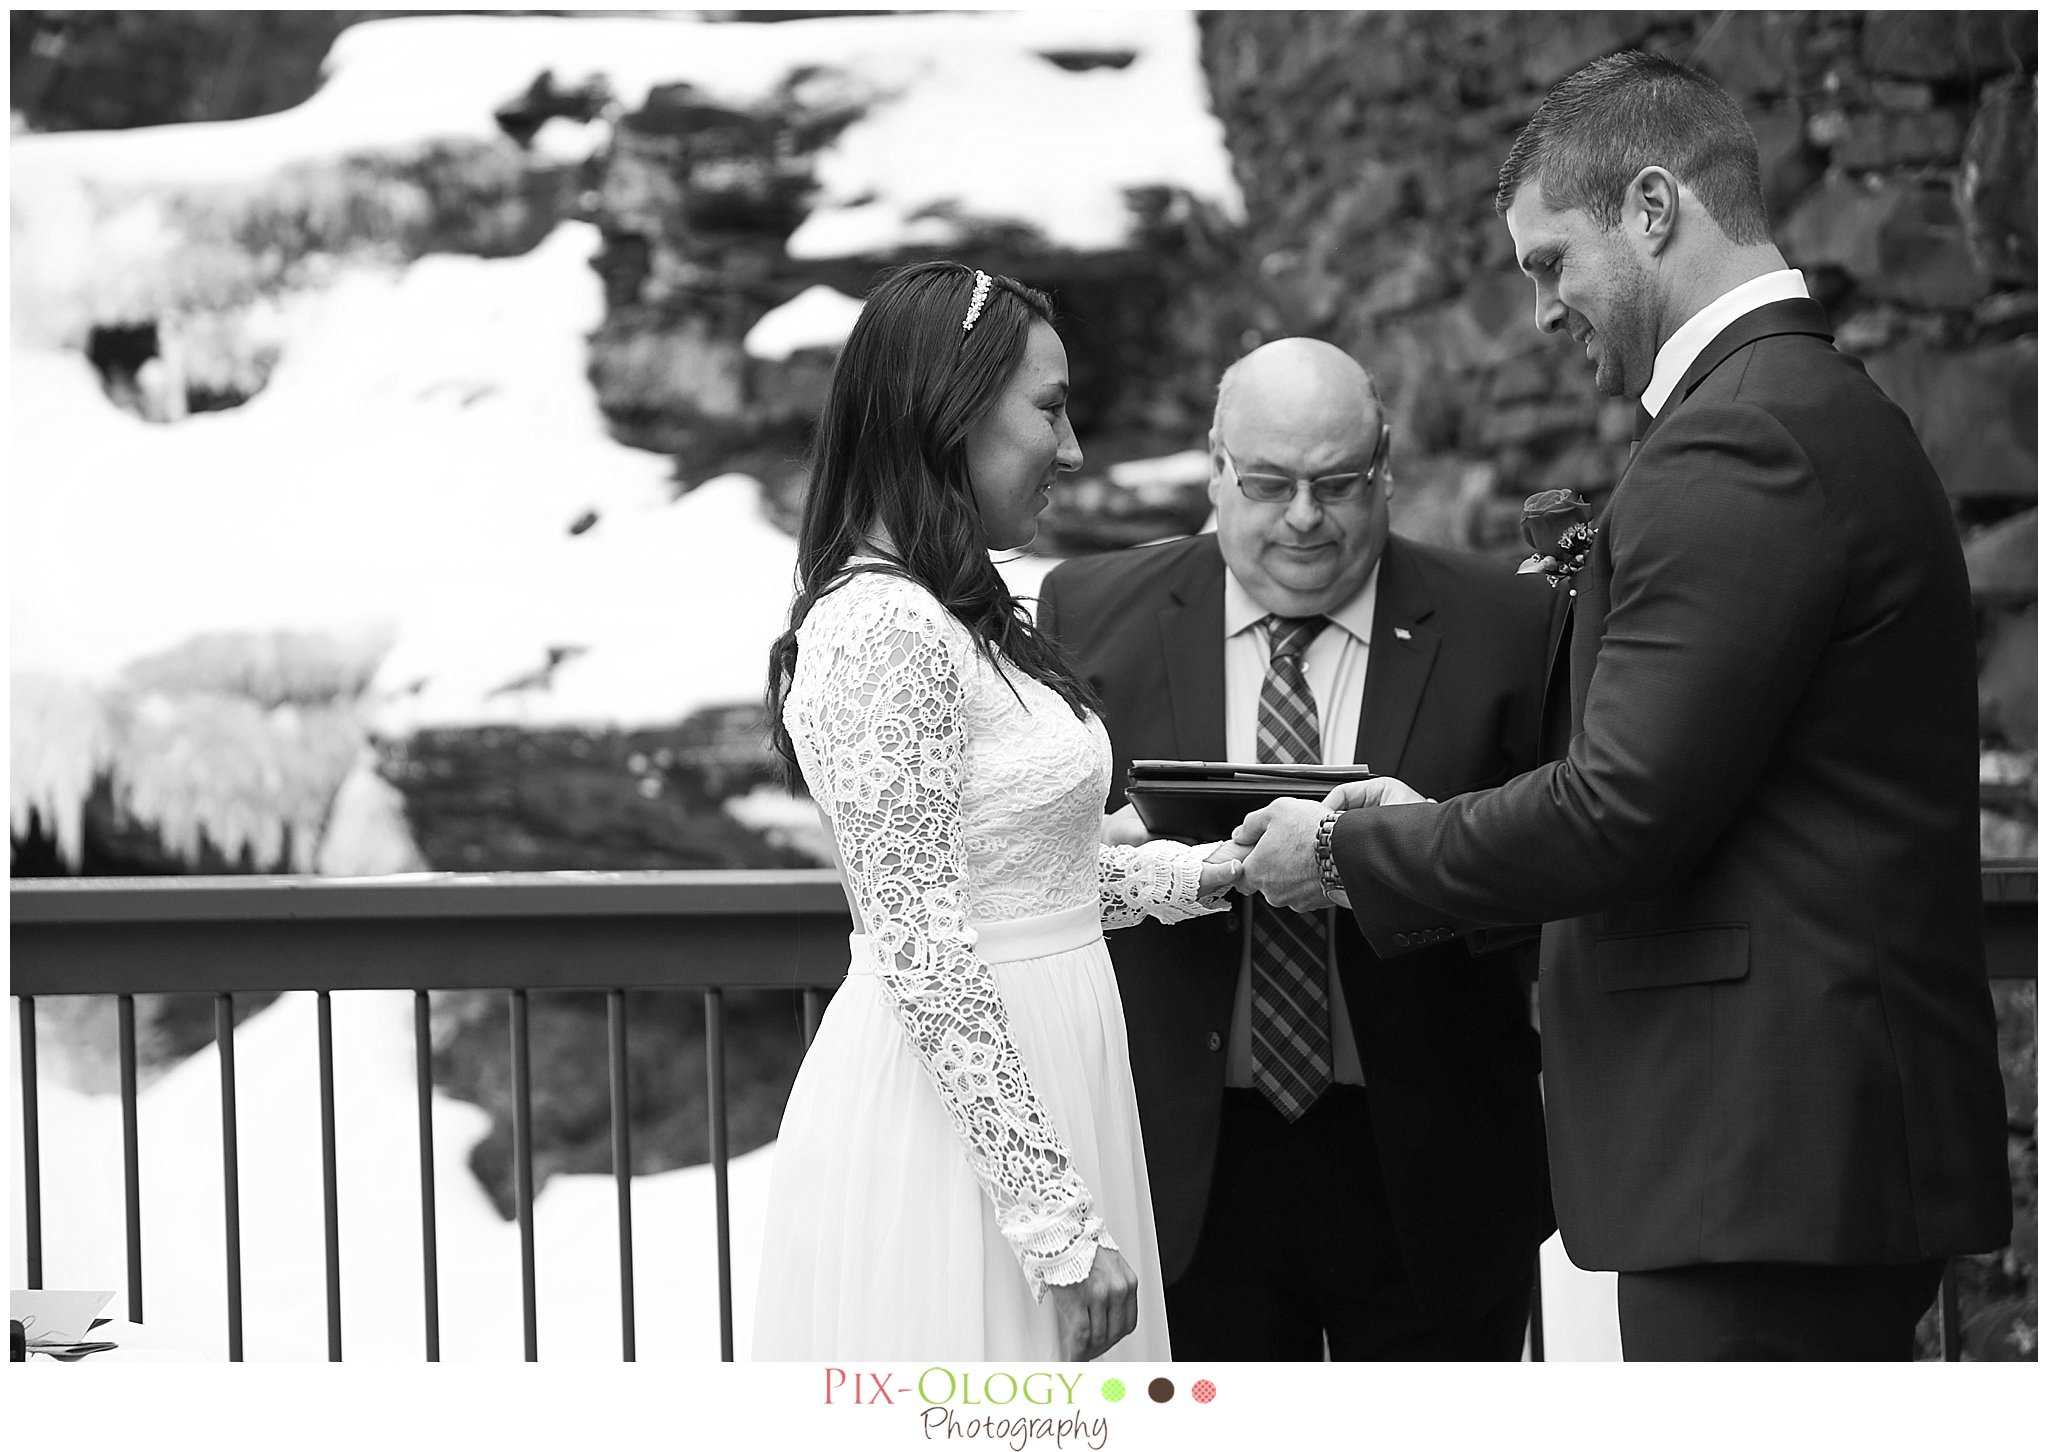 pix-ology photography wedding bride and groom winter wedding ledges hotel